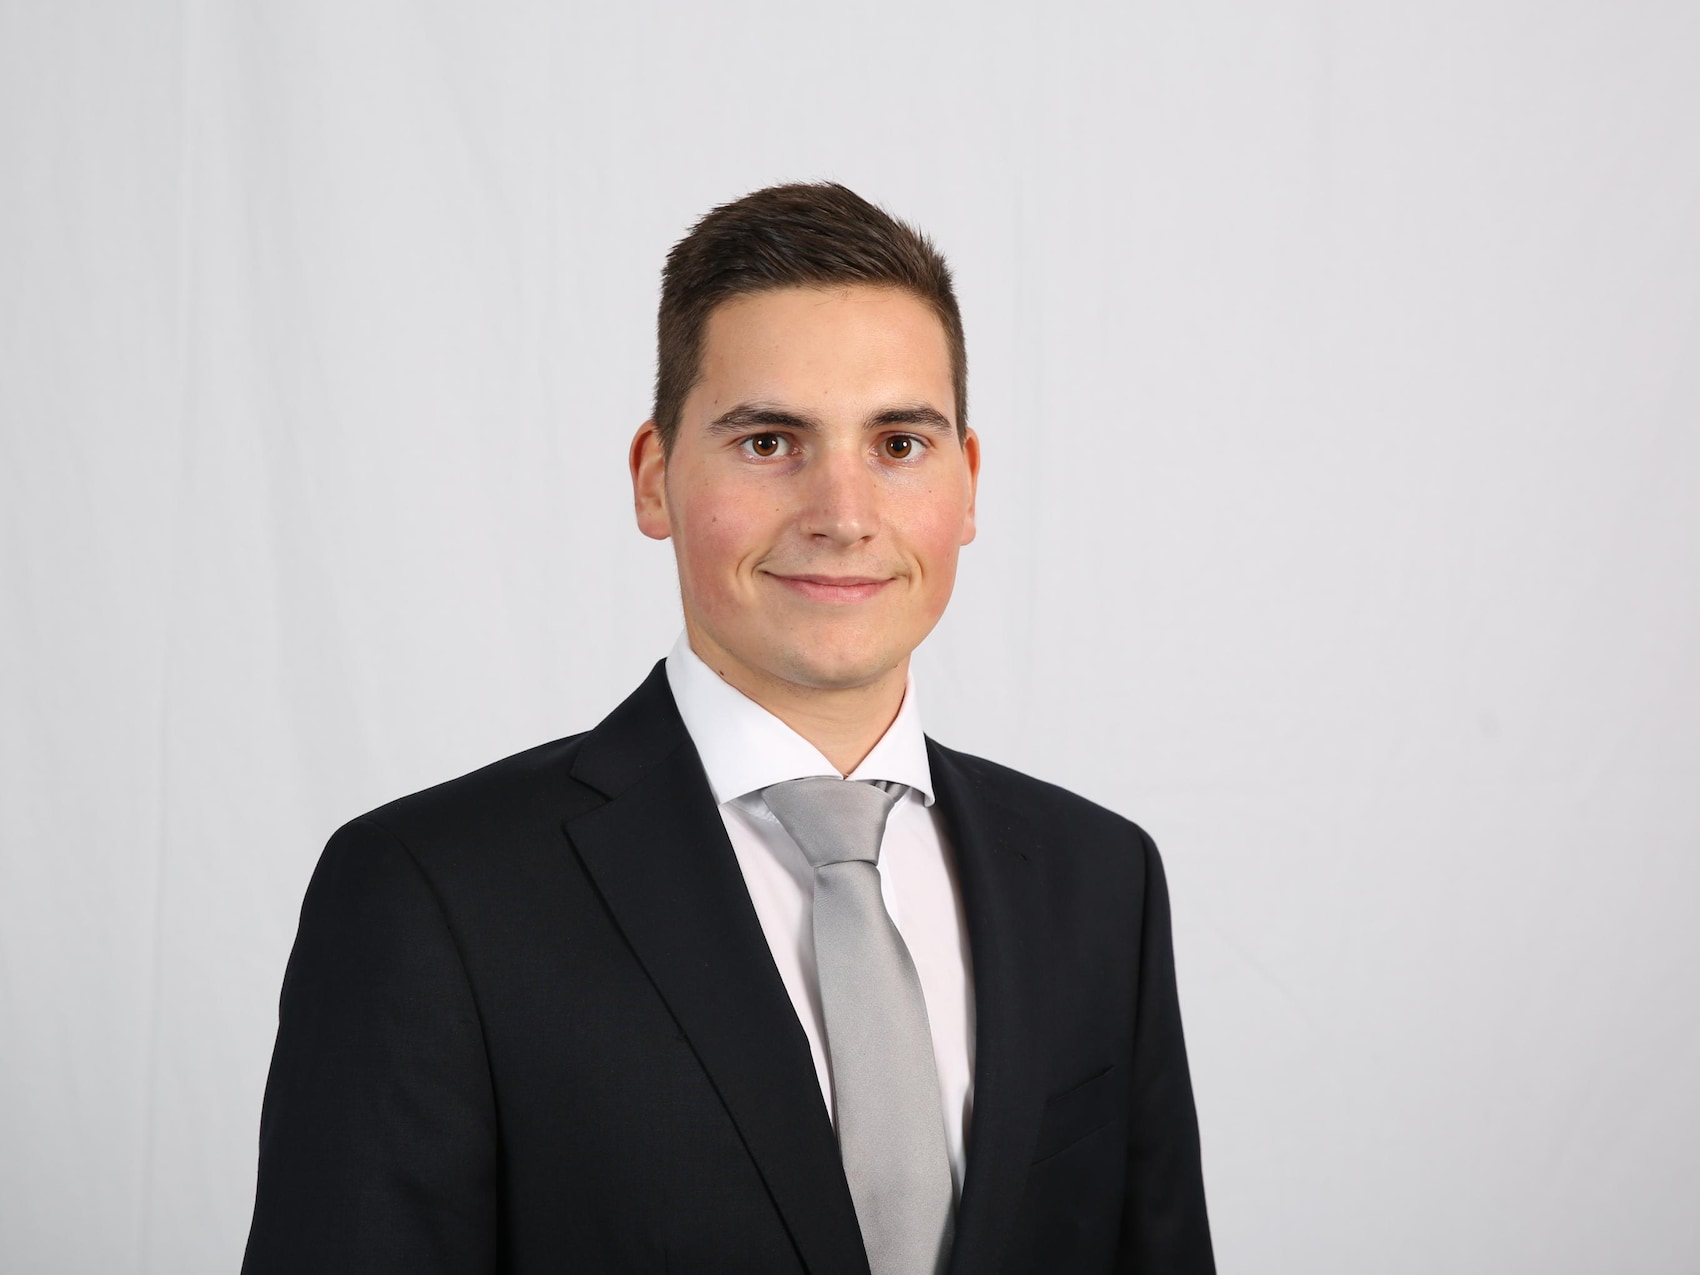 team-sc-Regensburg-Wolf-Konstantin